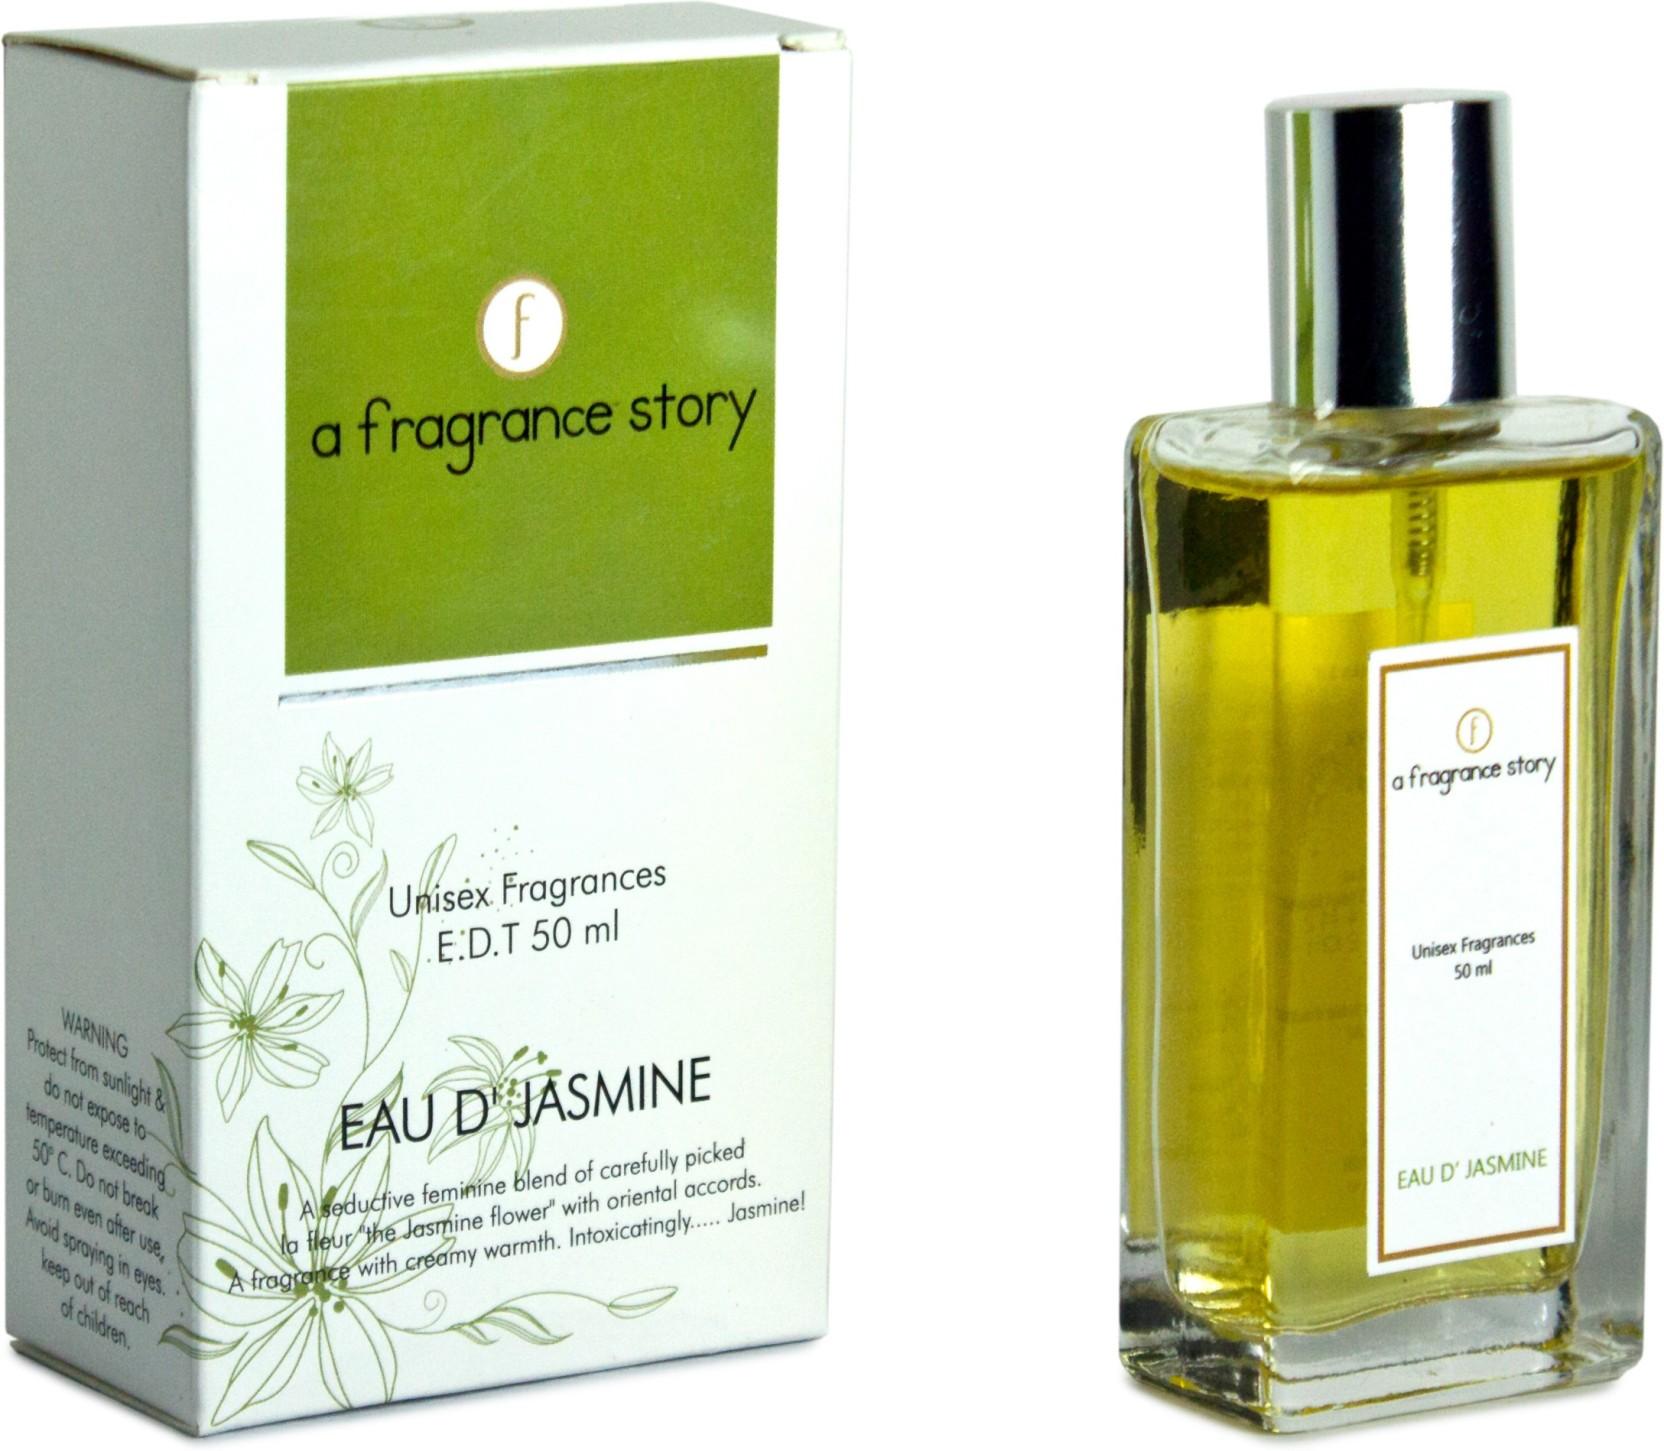 A fragrance story eau d jasmine edt 50 ml home izmirmasajfo